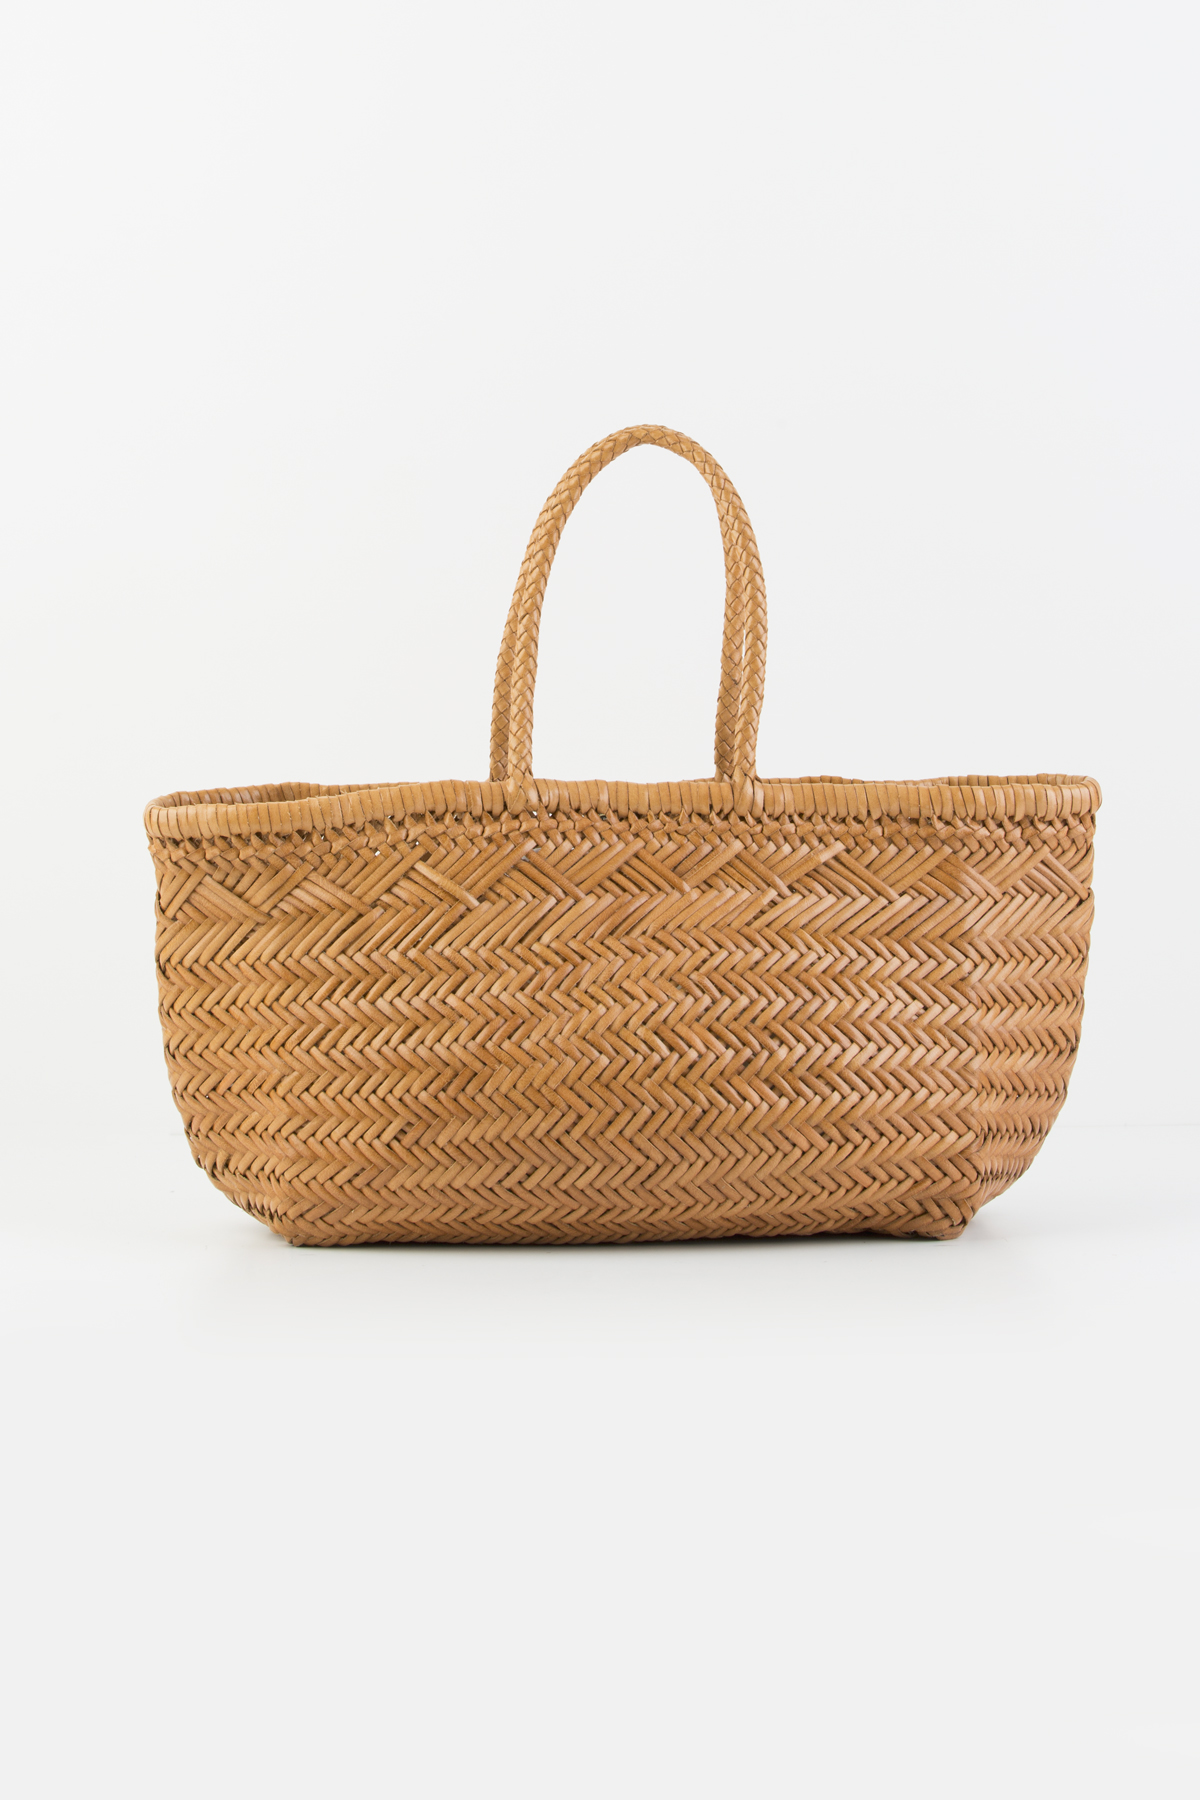 triple-big-nature-basket-leather-woven-dragon-diffusion-matchboxathens